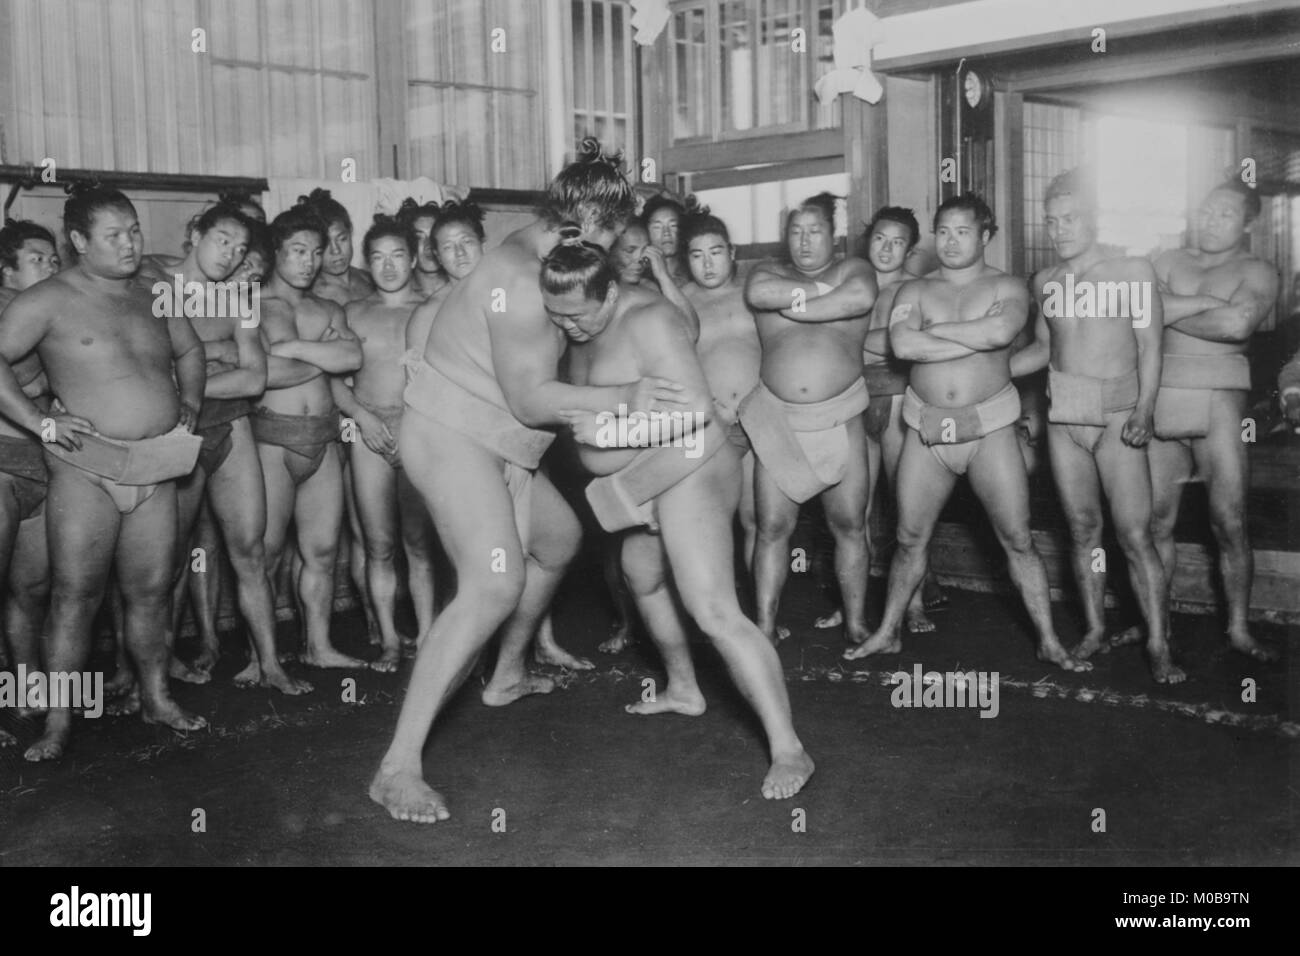 Sumo Wrestlers - Stock Image